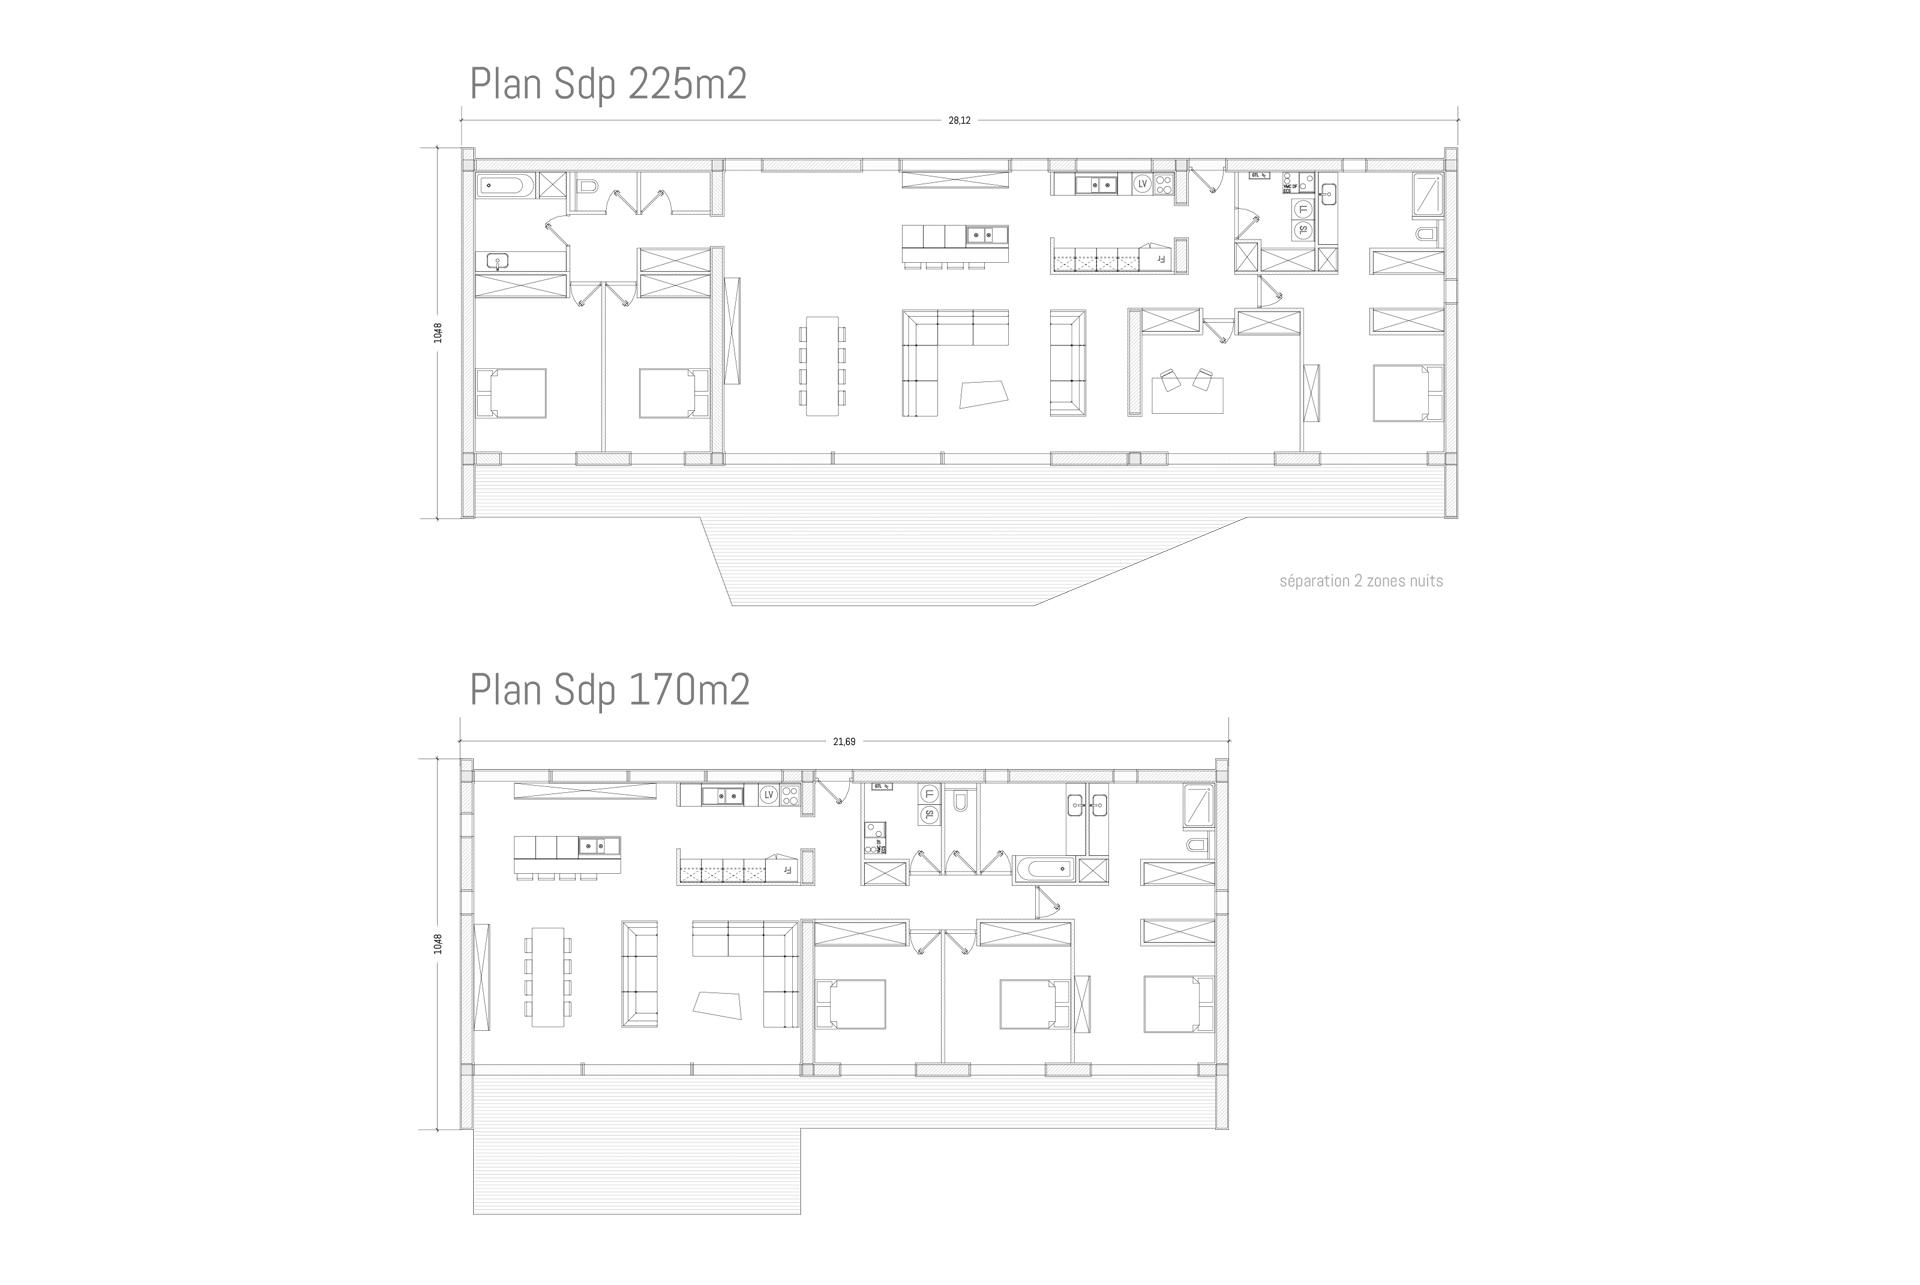 quartz popup house. Black Bedroom Furniture Sets. Home Design Ideas